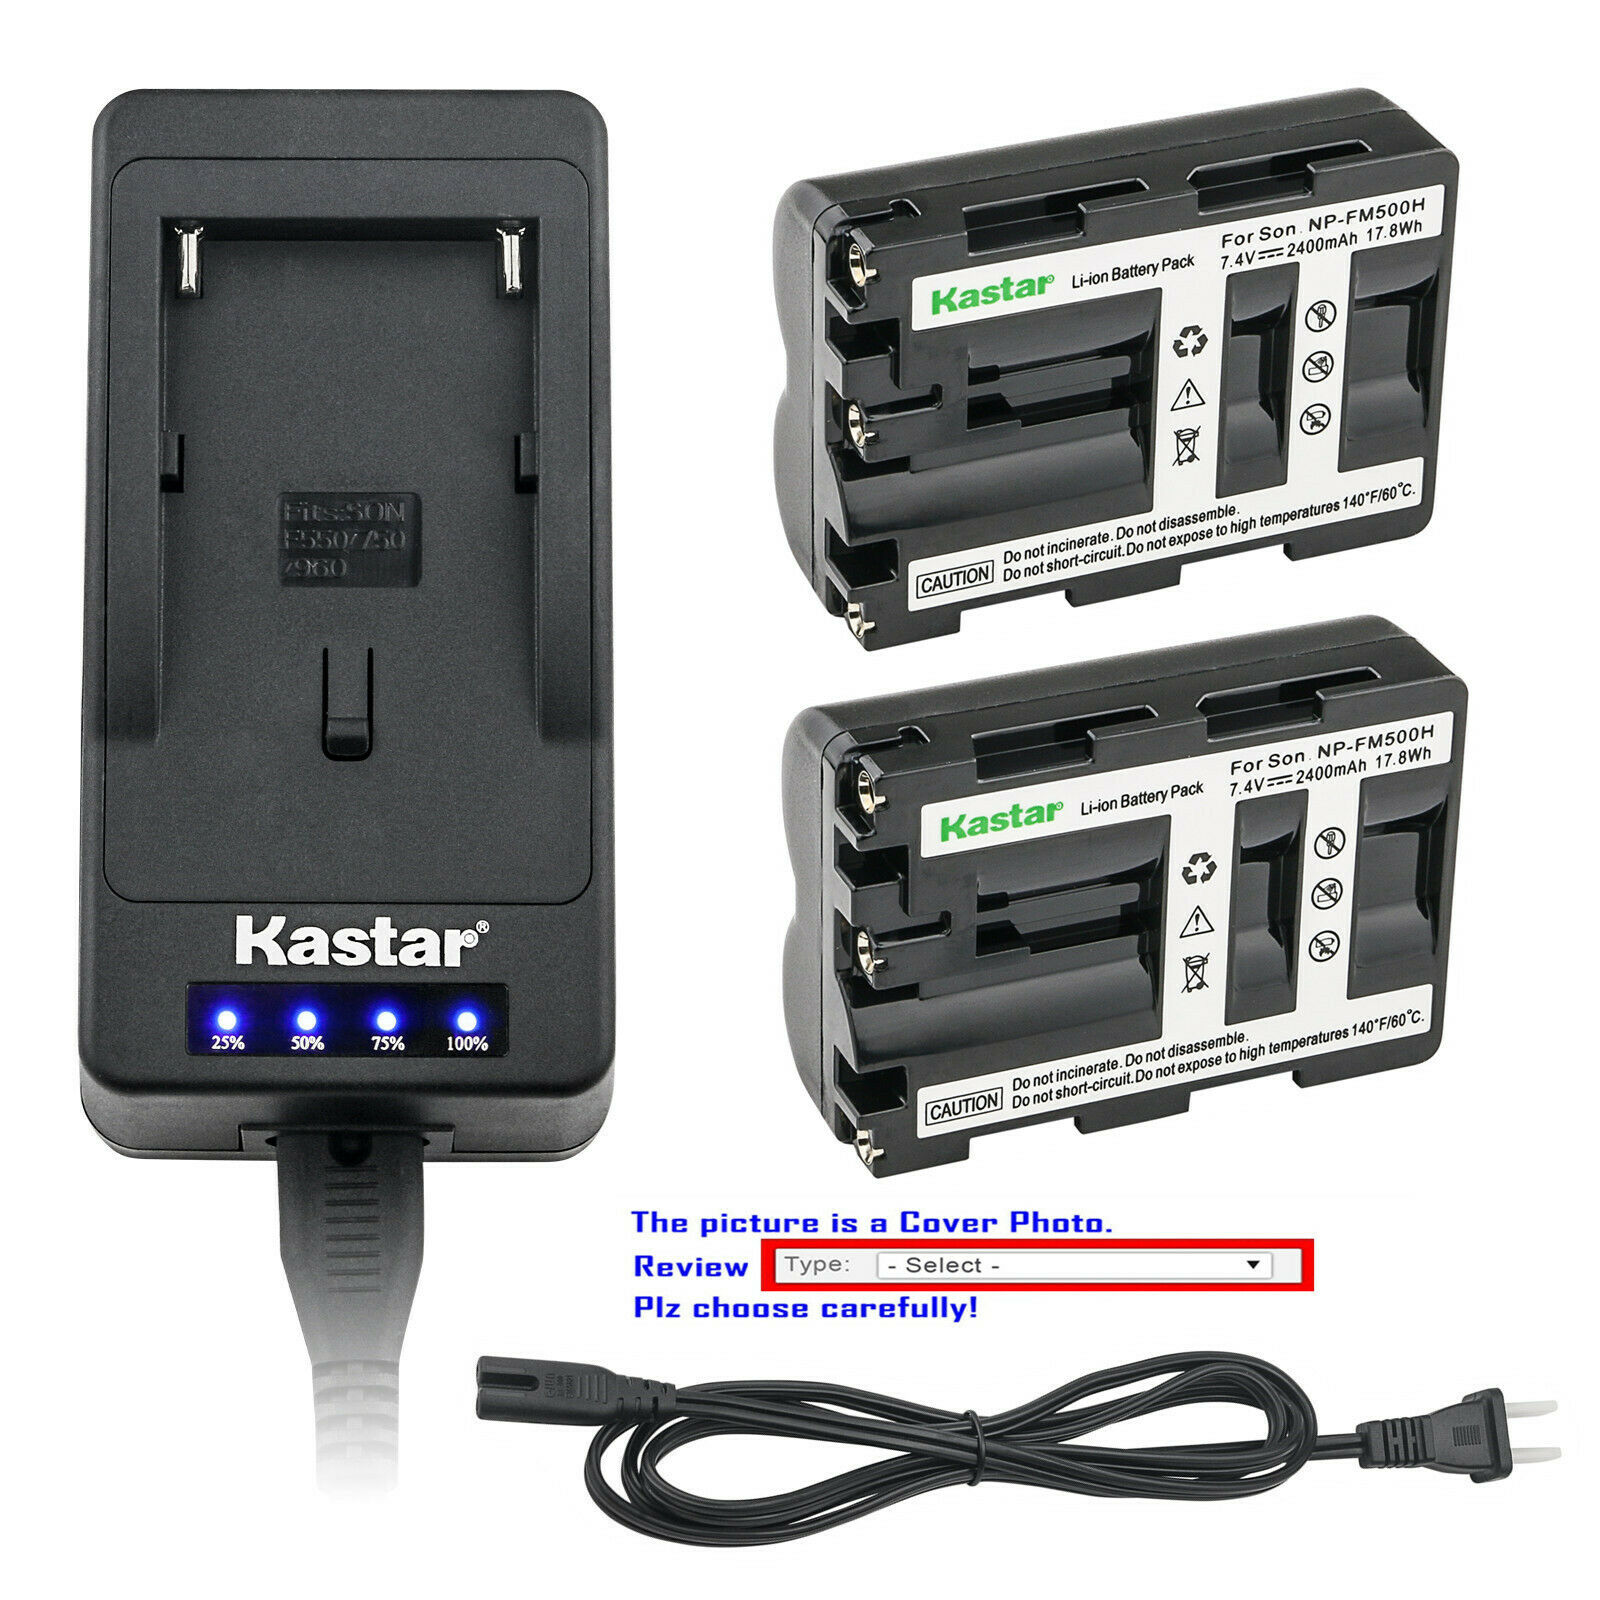 Suoer battery charger ram 2500 headlight bulb